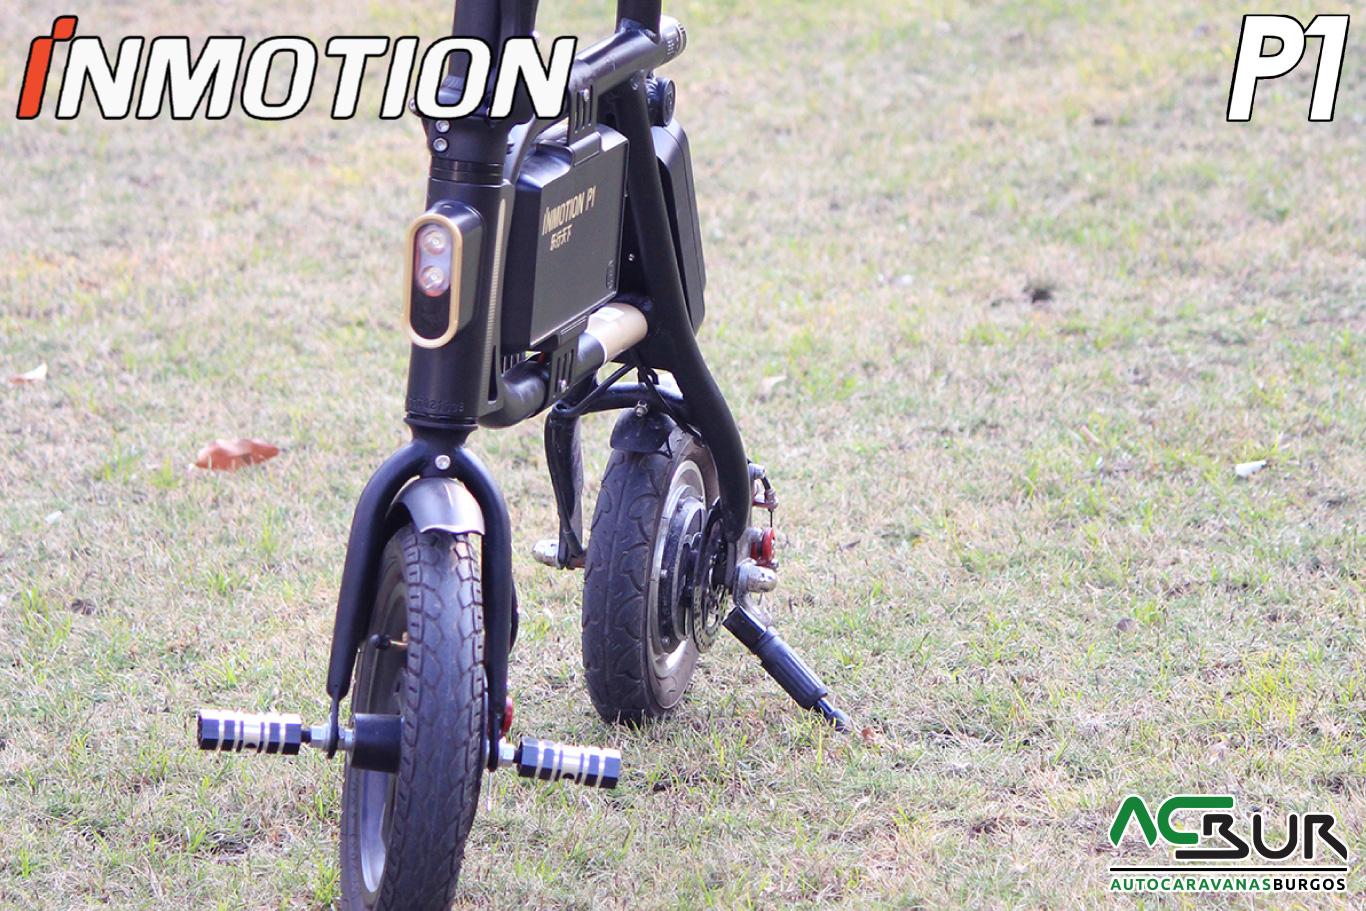 Alquilar bicicleta eléctrica autocaravanas